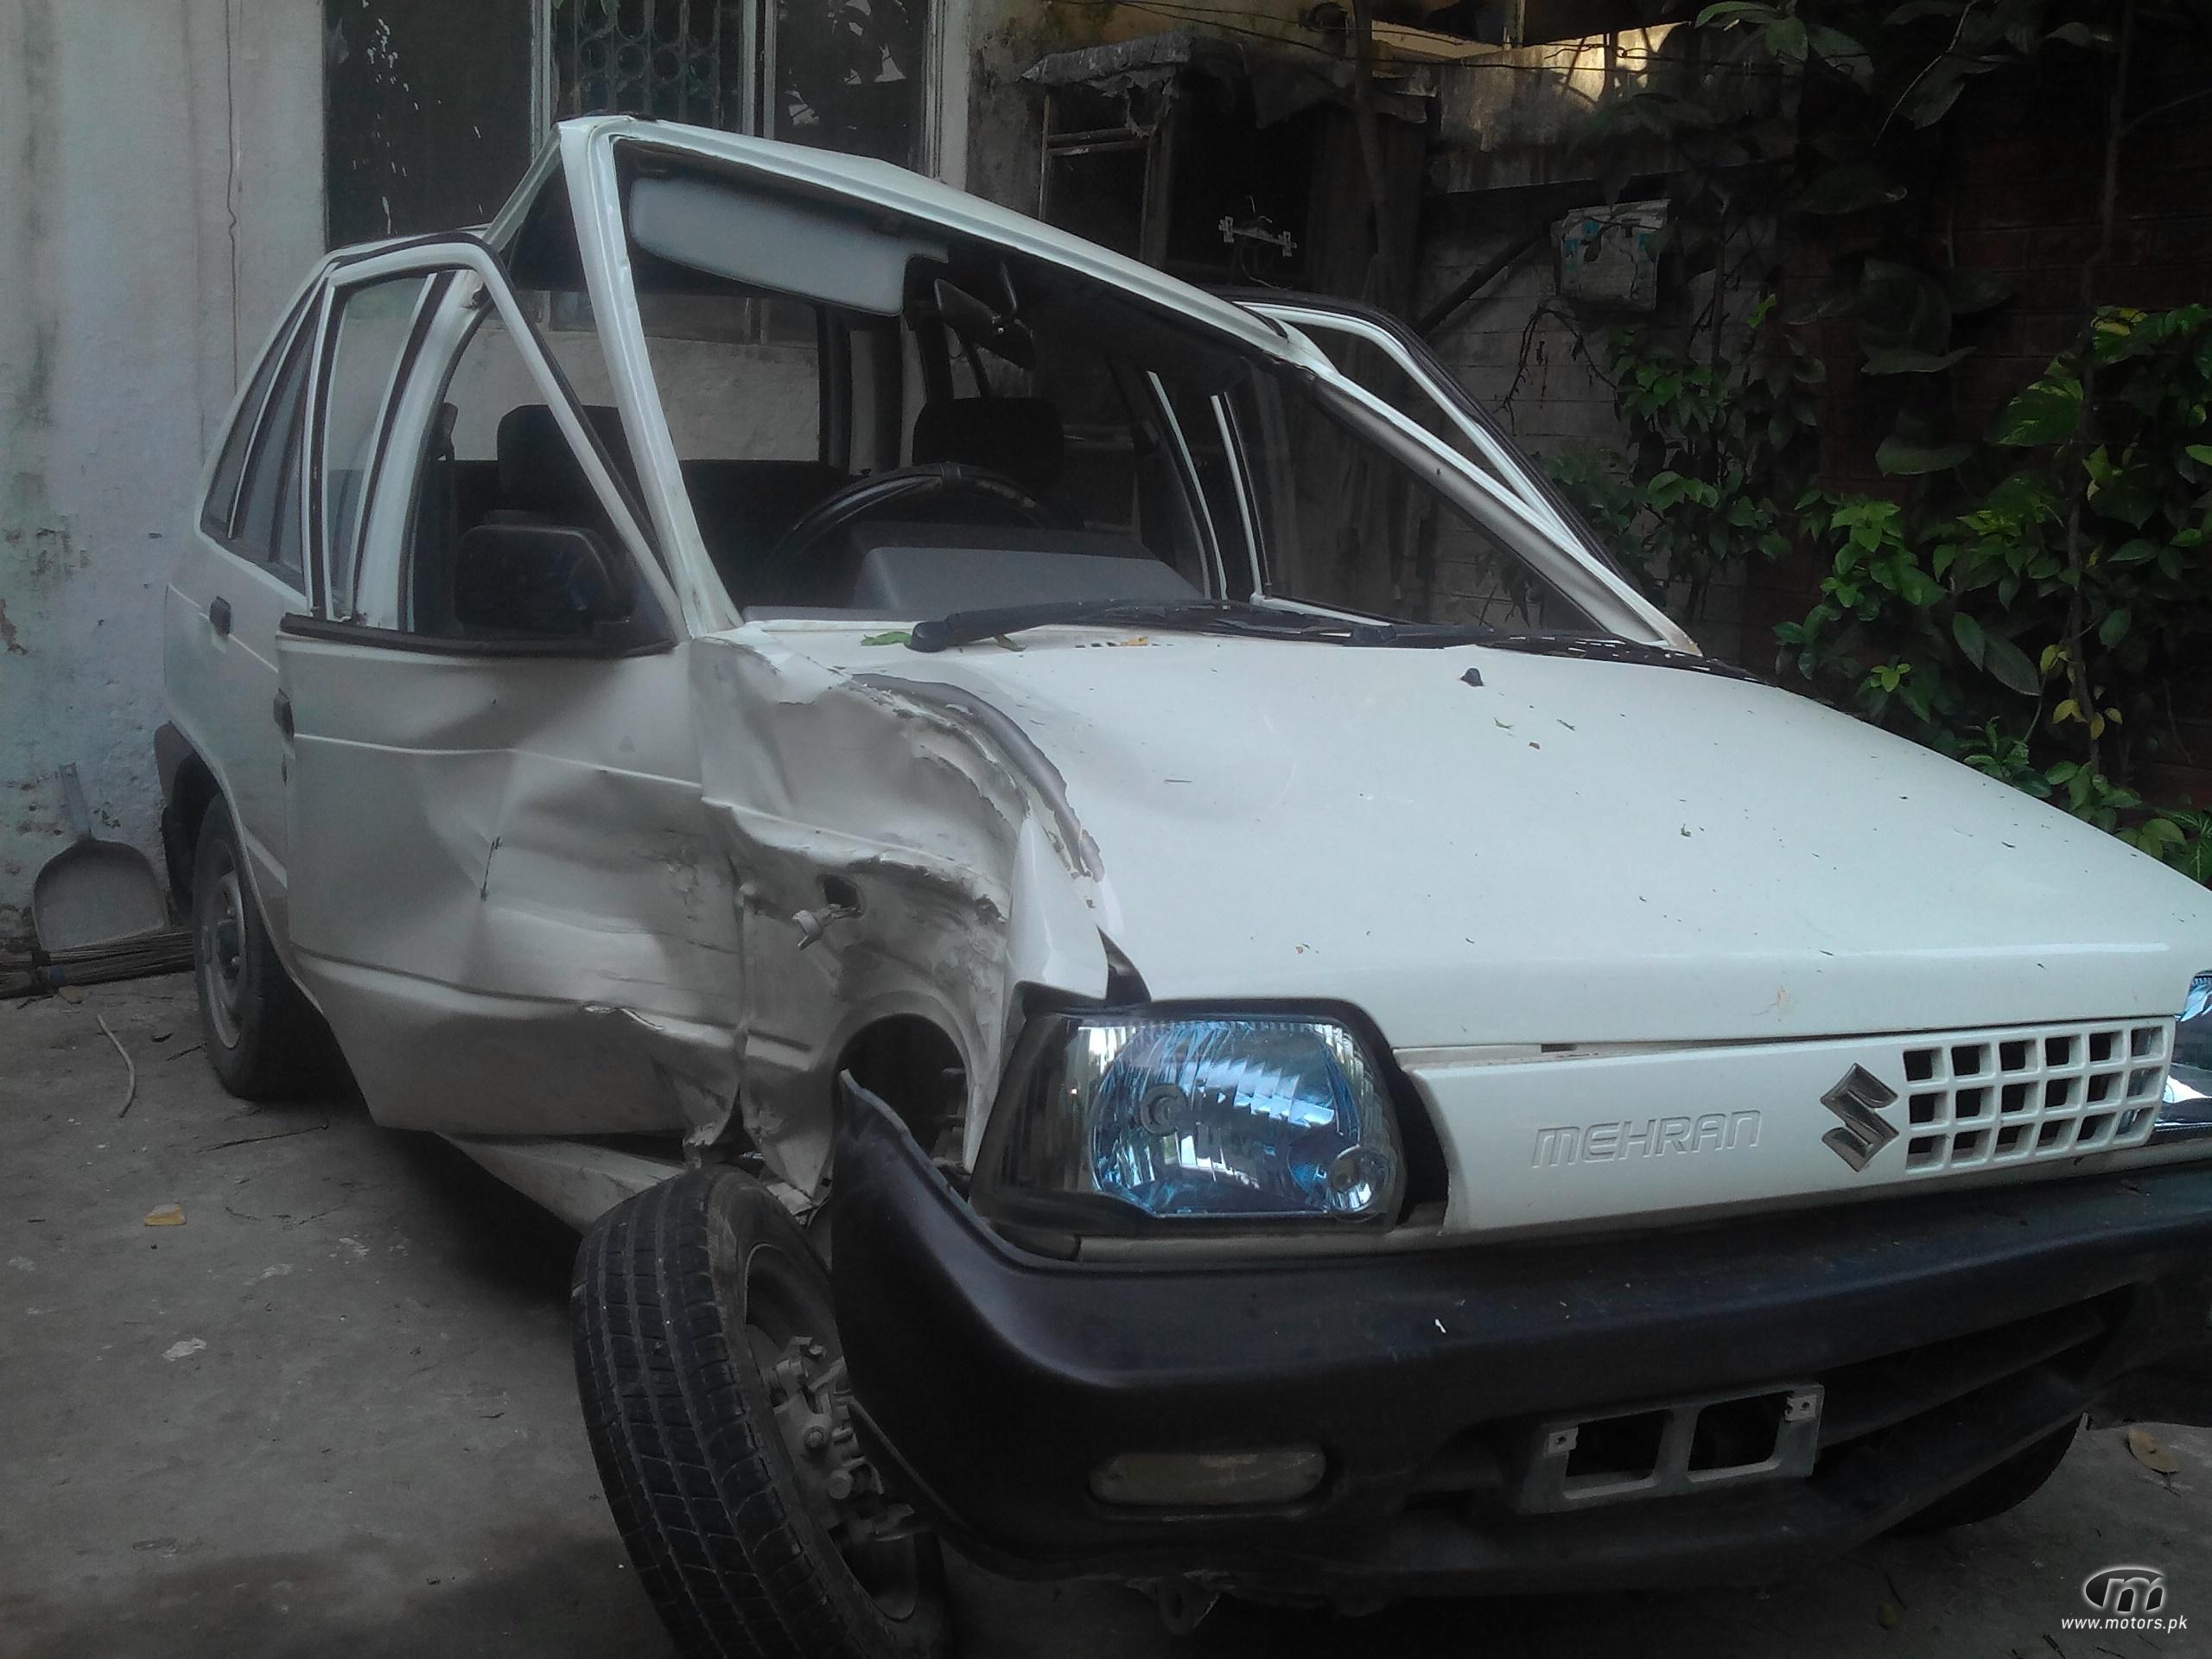 Used Suzuki Mehran 2012 For Sale In Islamabad Ad 7938